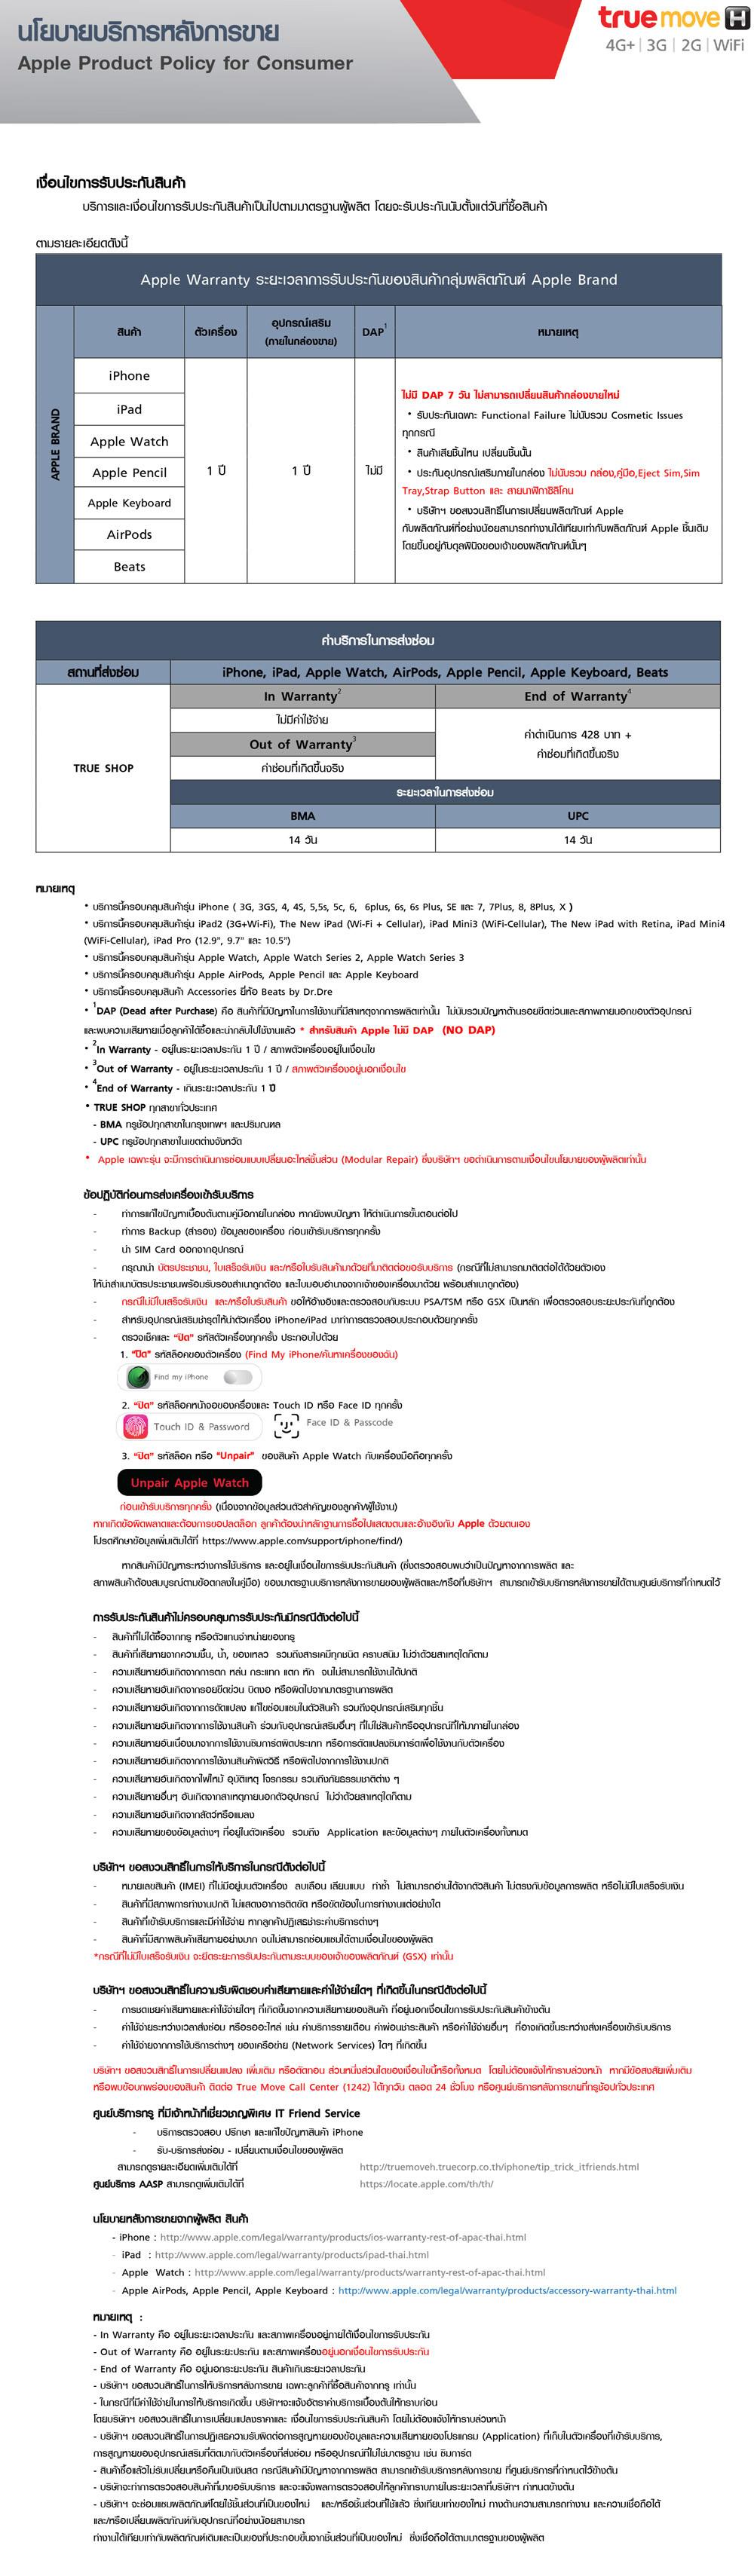 apple-warranty-policy-20-nov-17.jpg